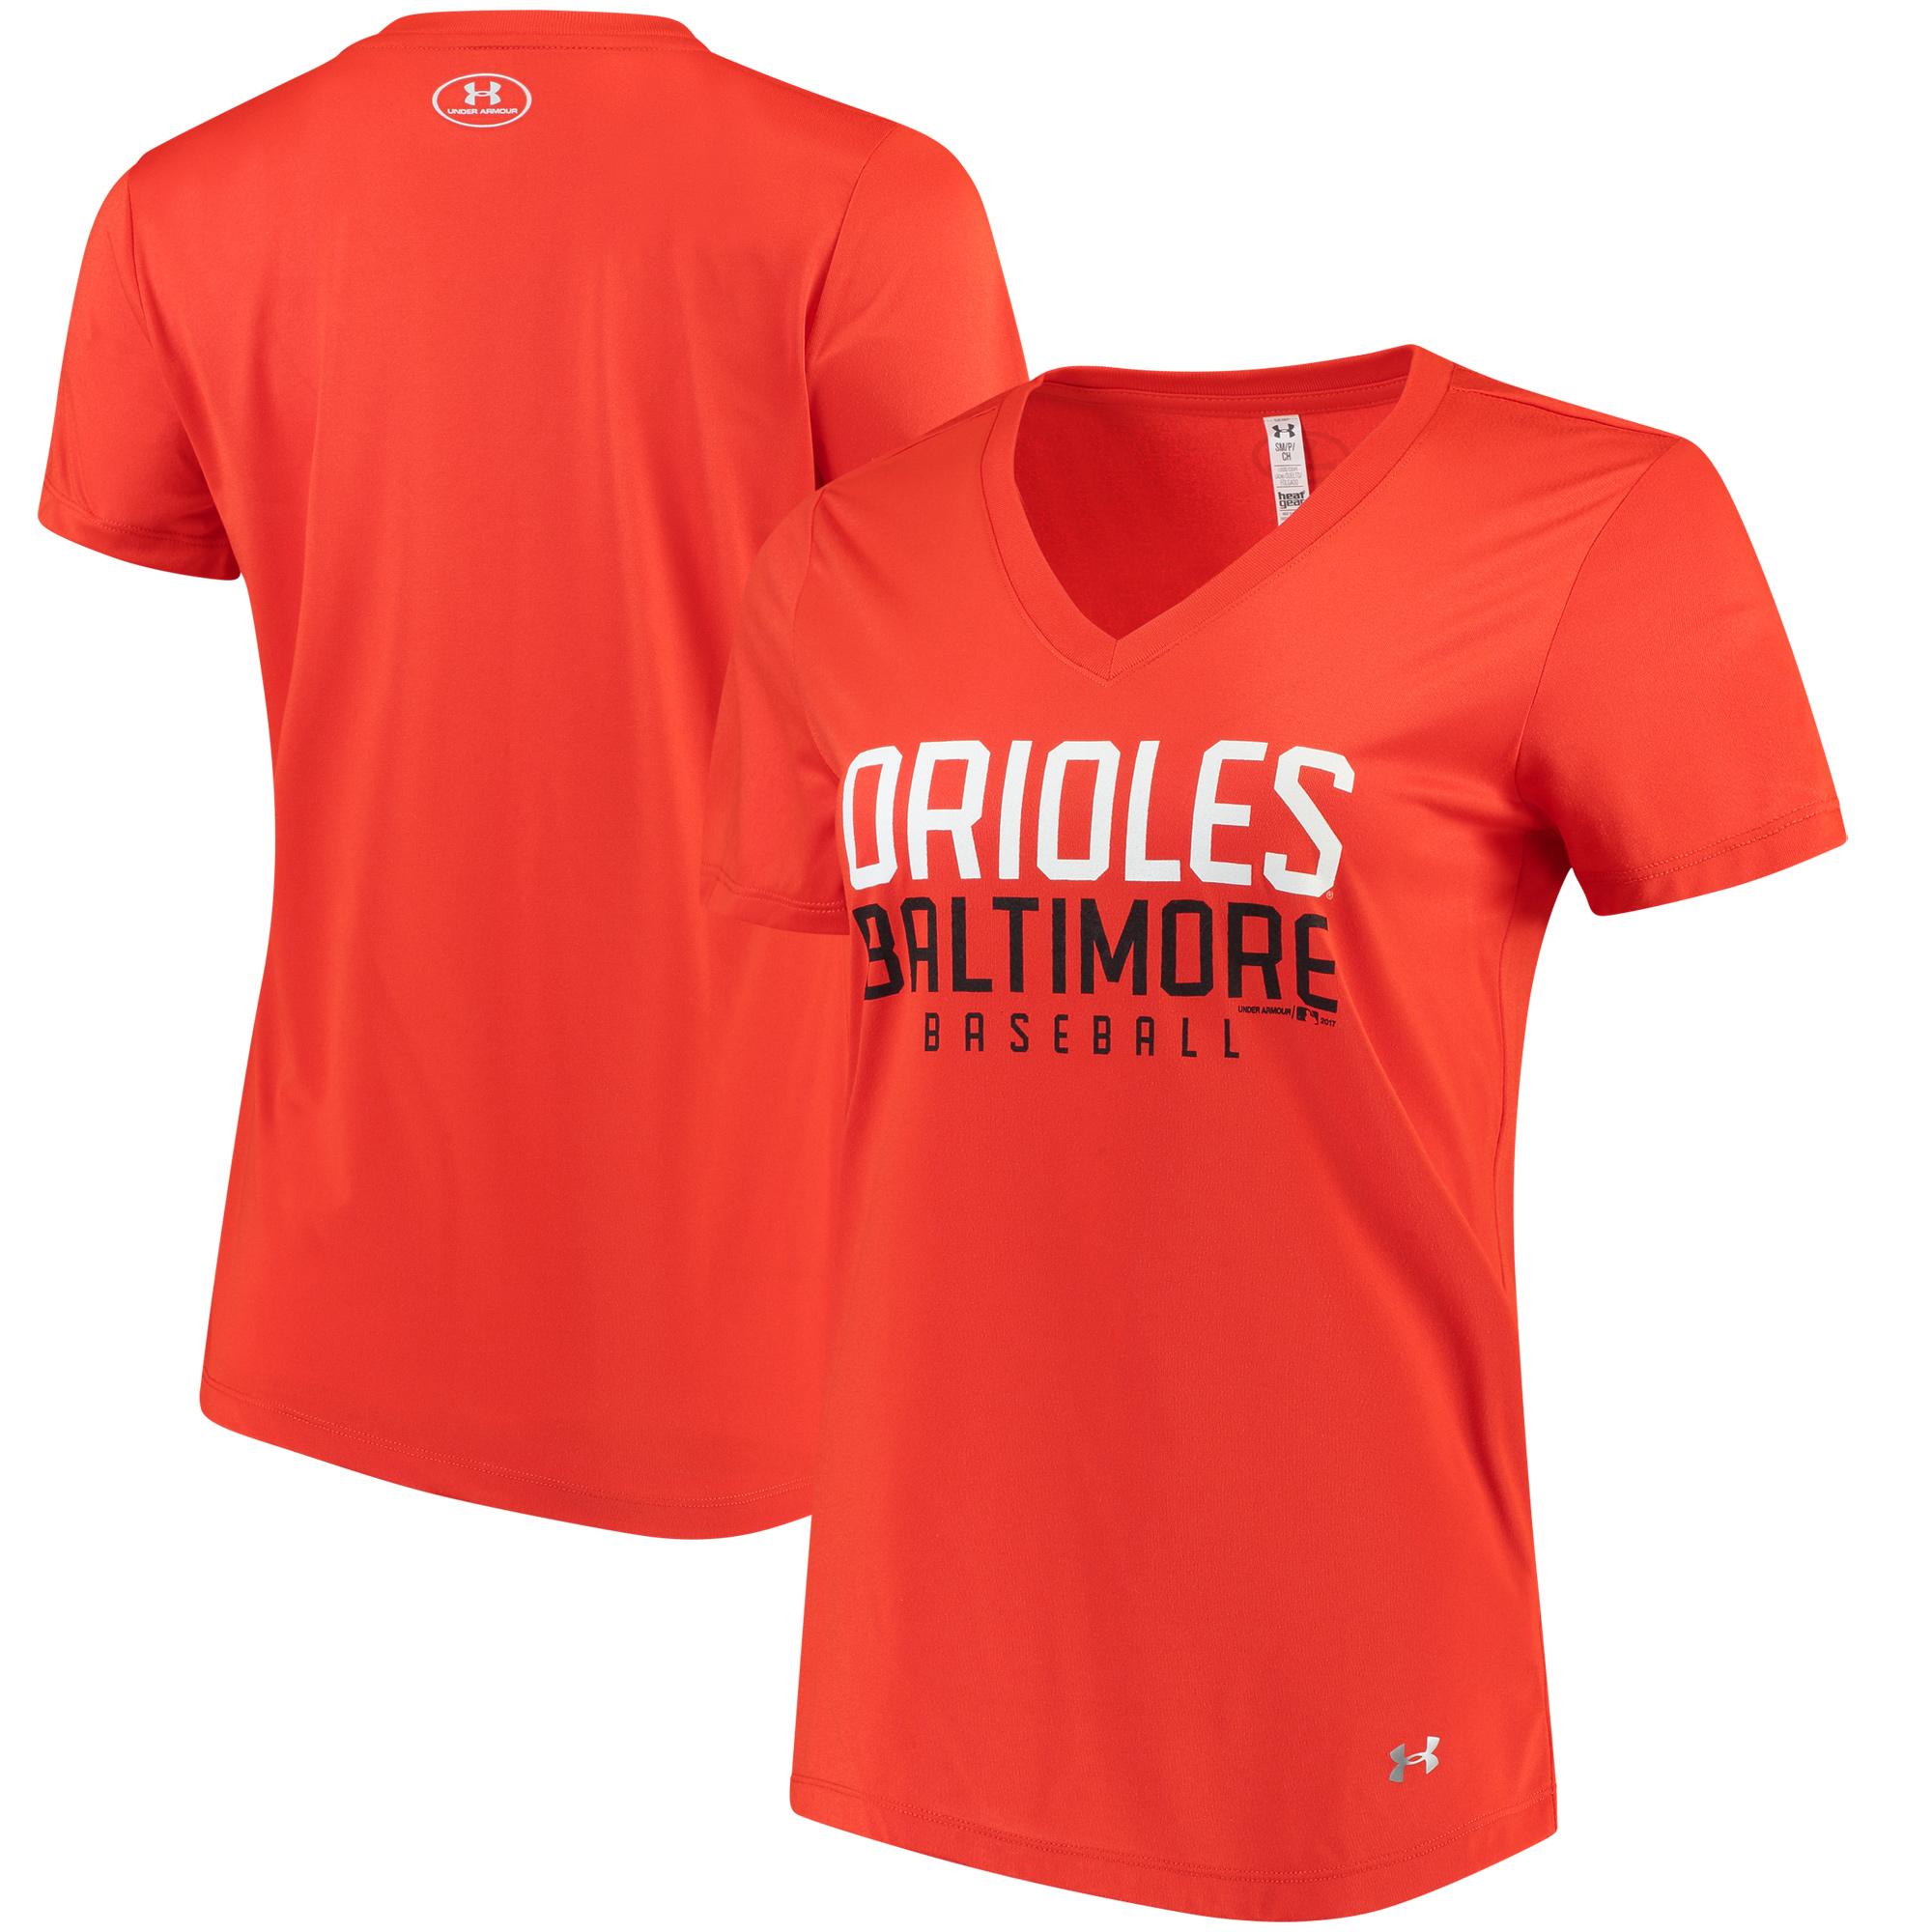 Baltimore Orioles Under Armour Women's Tech Performance V-Neck T-Shirt - Orange